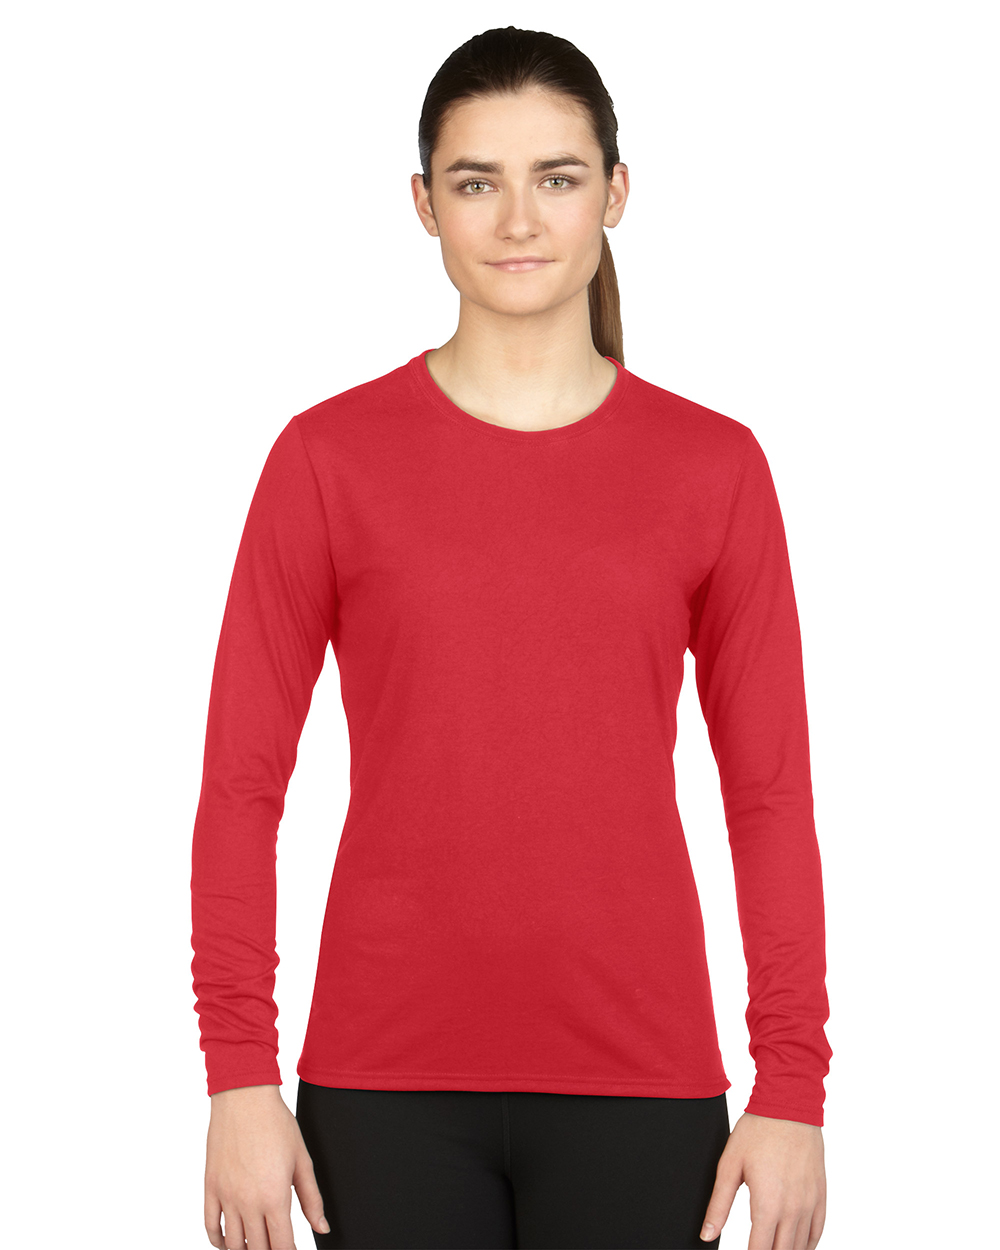 Gildan 42400L     Ladies Long Sleeve Performance    4.5 oz. 100% Polyester( Cotton Feel)